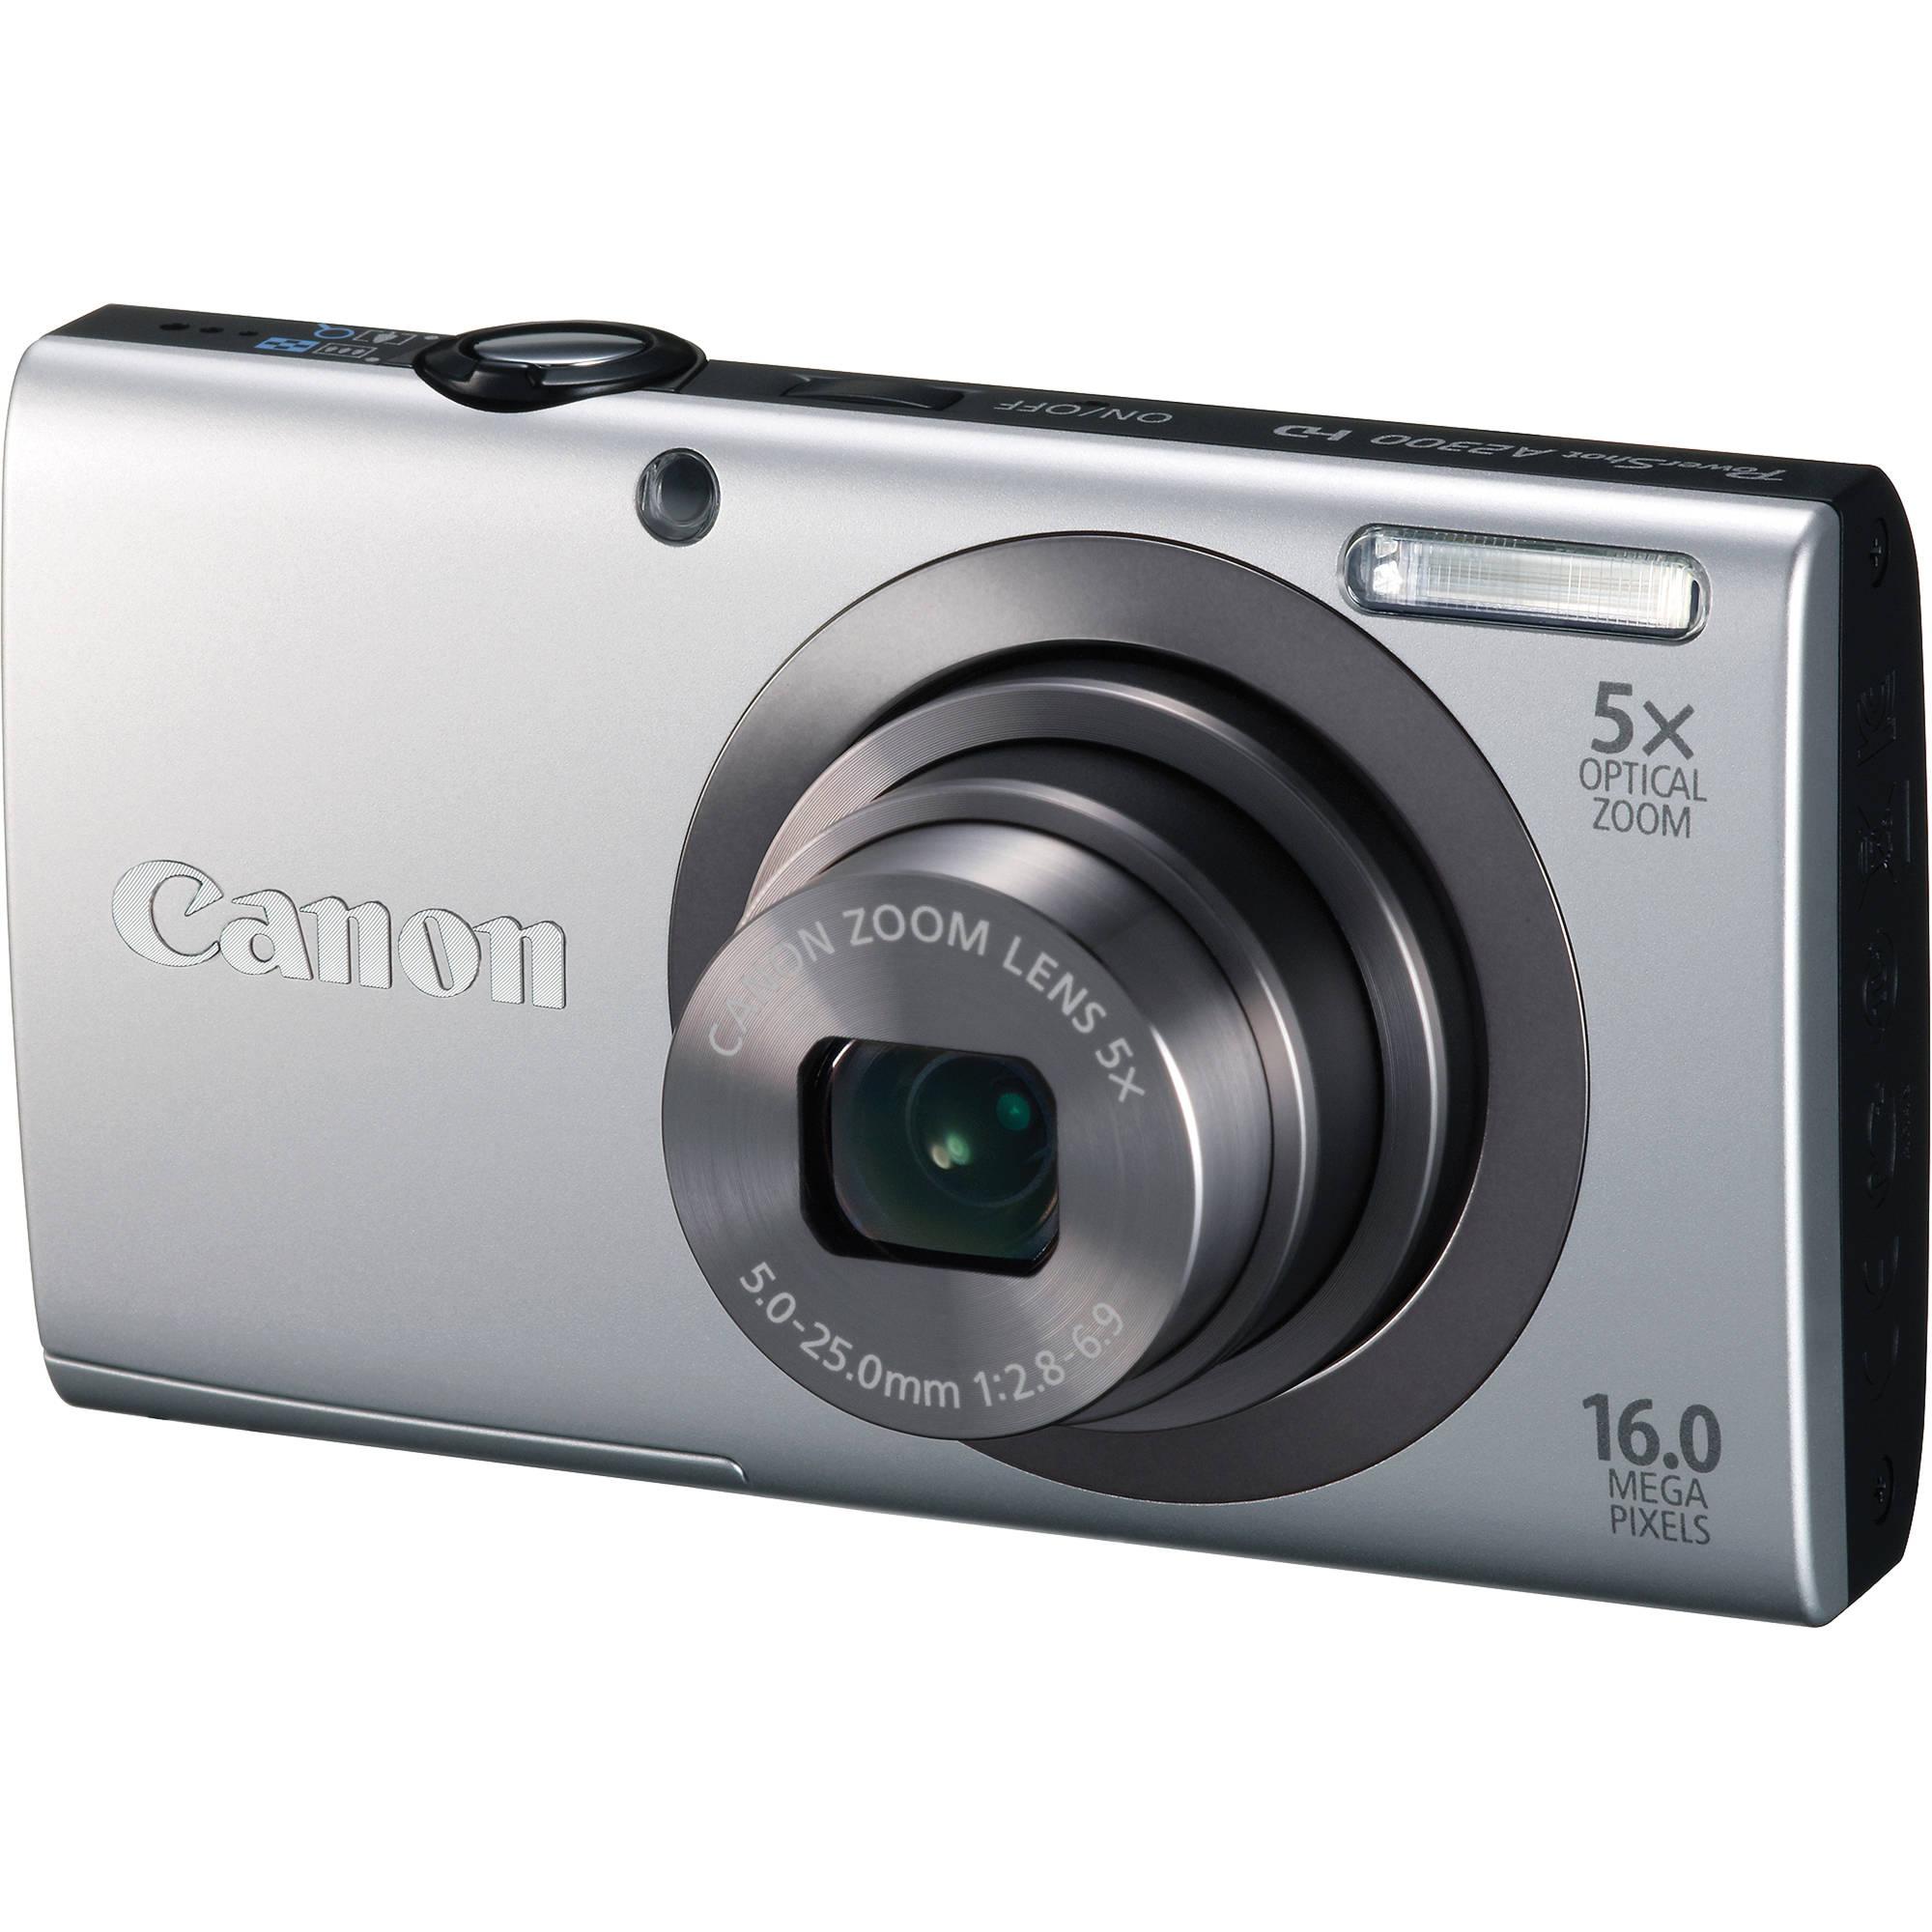 canon powershot a2300 digital camera silver 6184b001 b h photo rh bhphotovideo com Walmart Canon PowerShot A2300 Canon PowerShot A2300 Owner's Manual